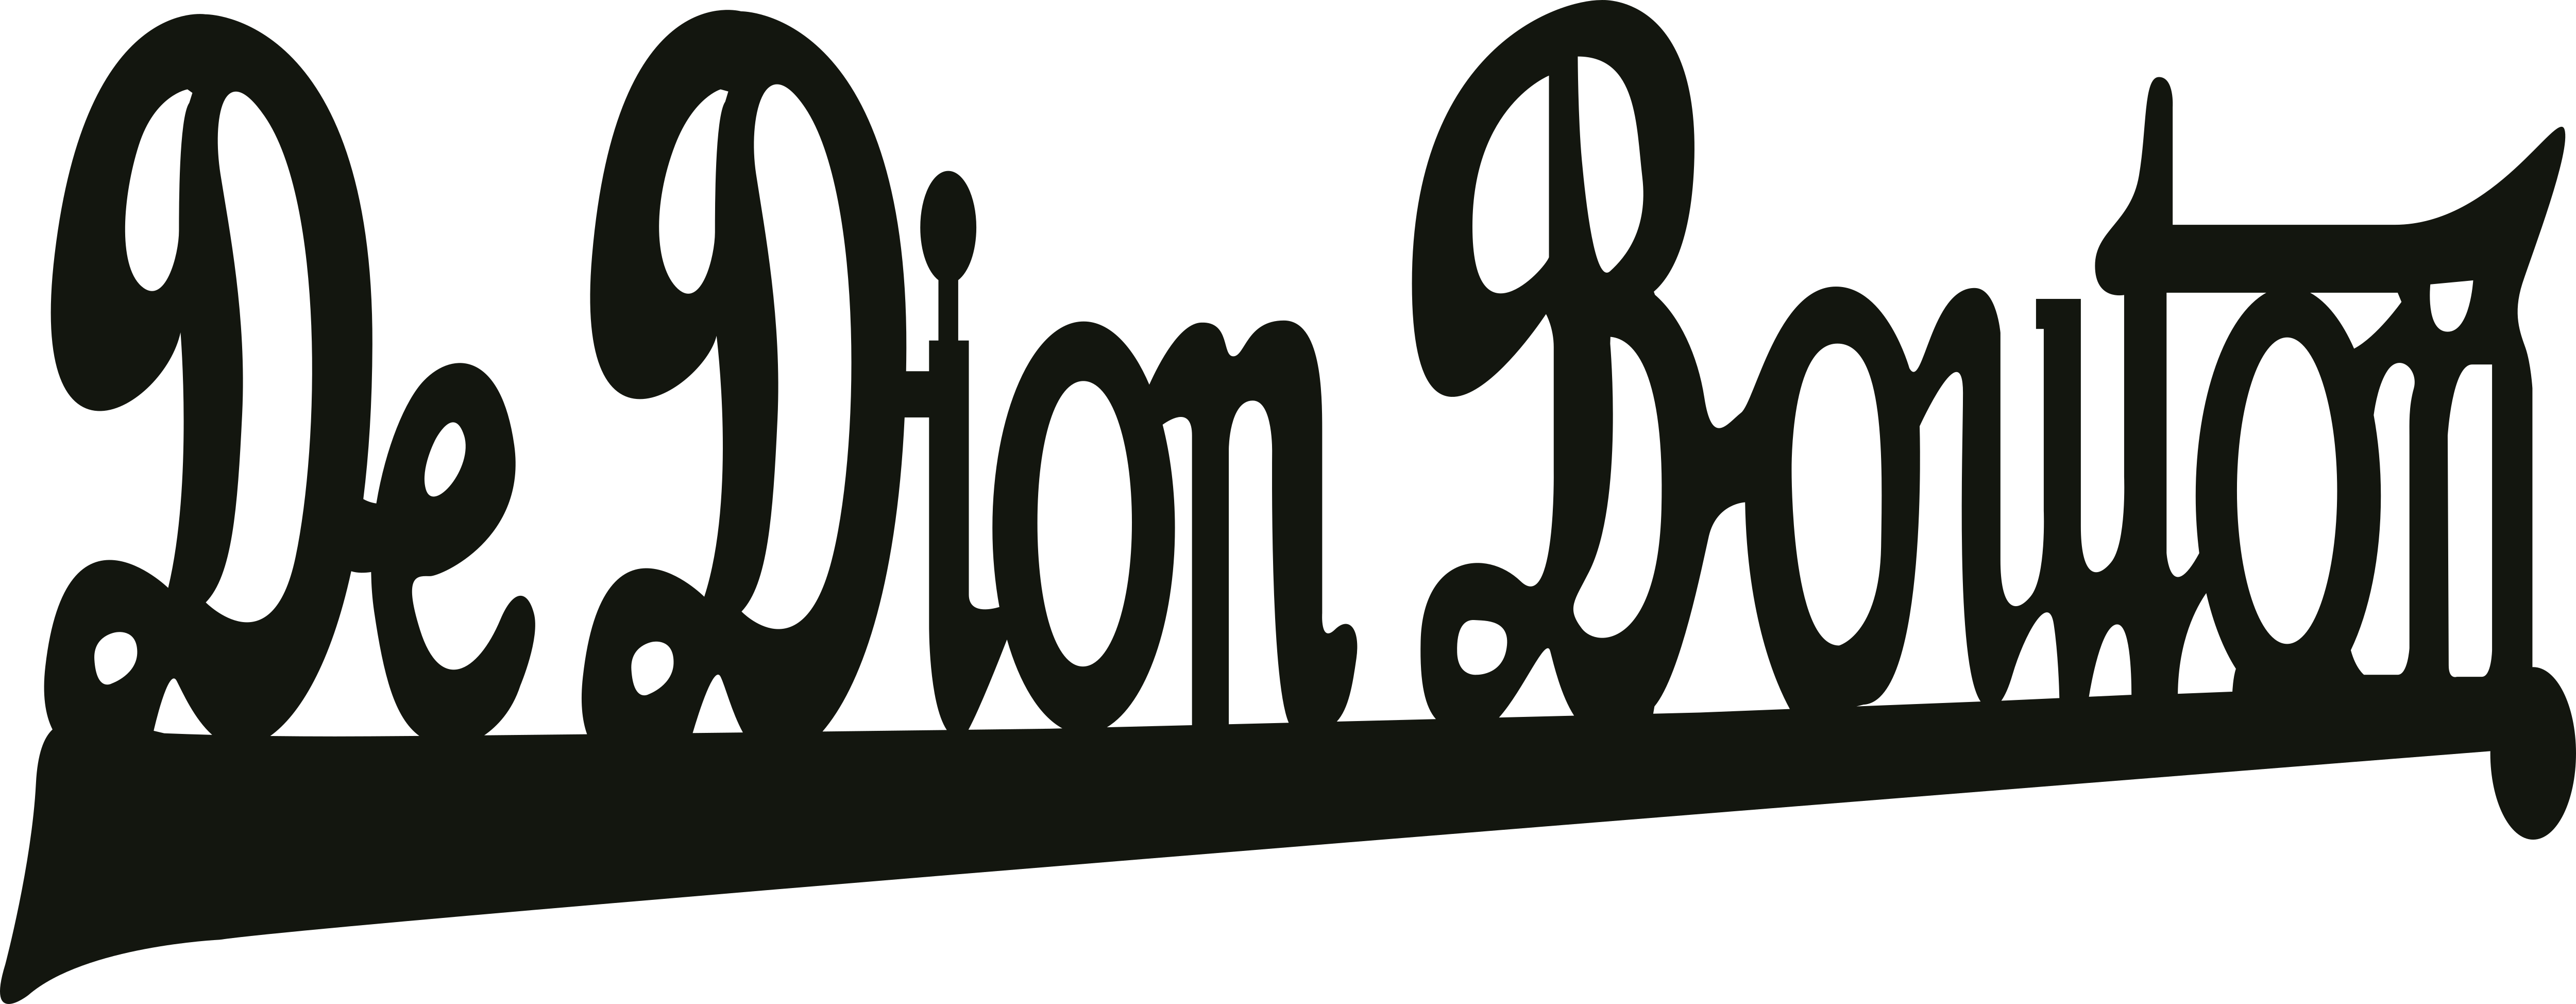 De Dion Bouton Logos Download